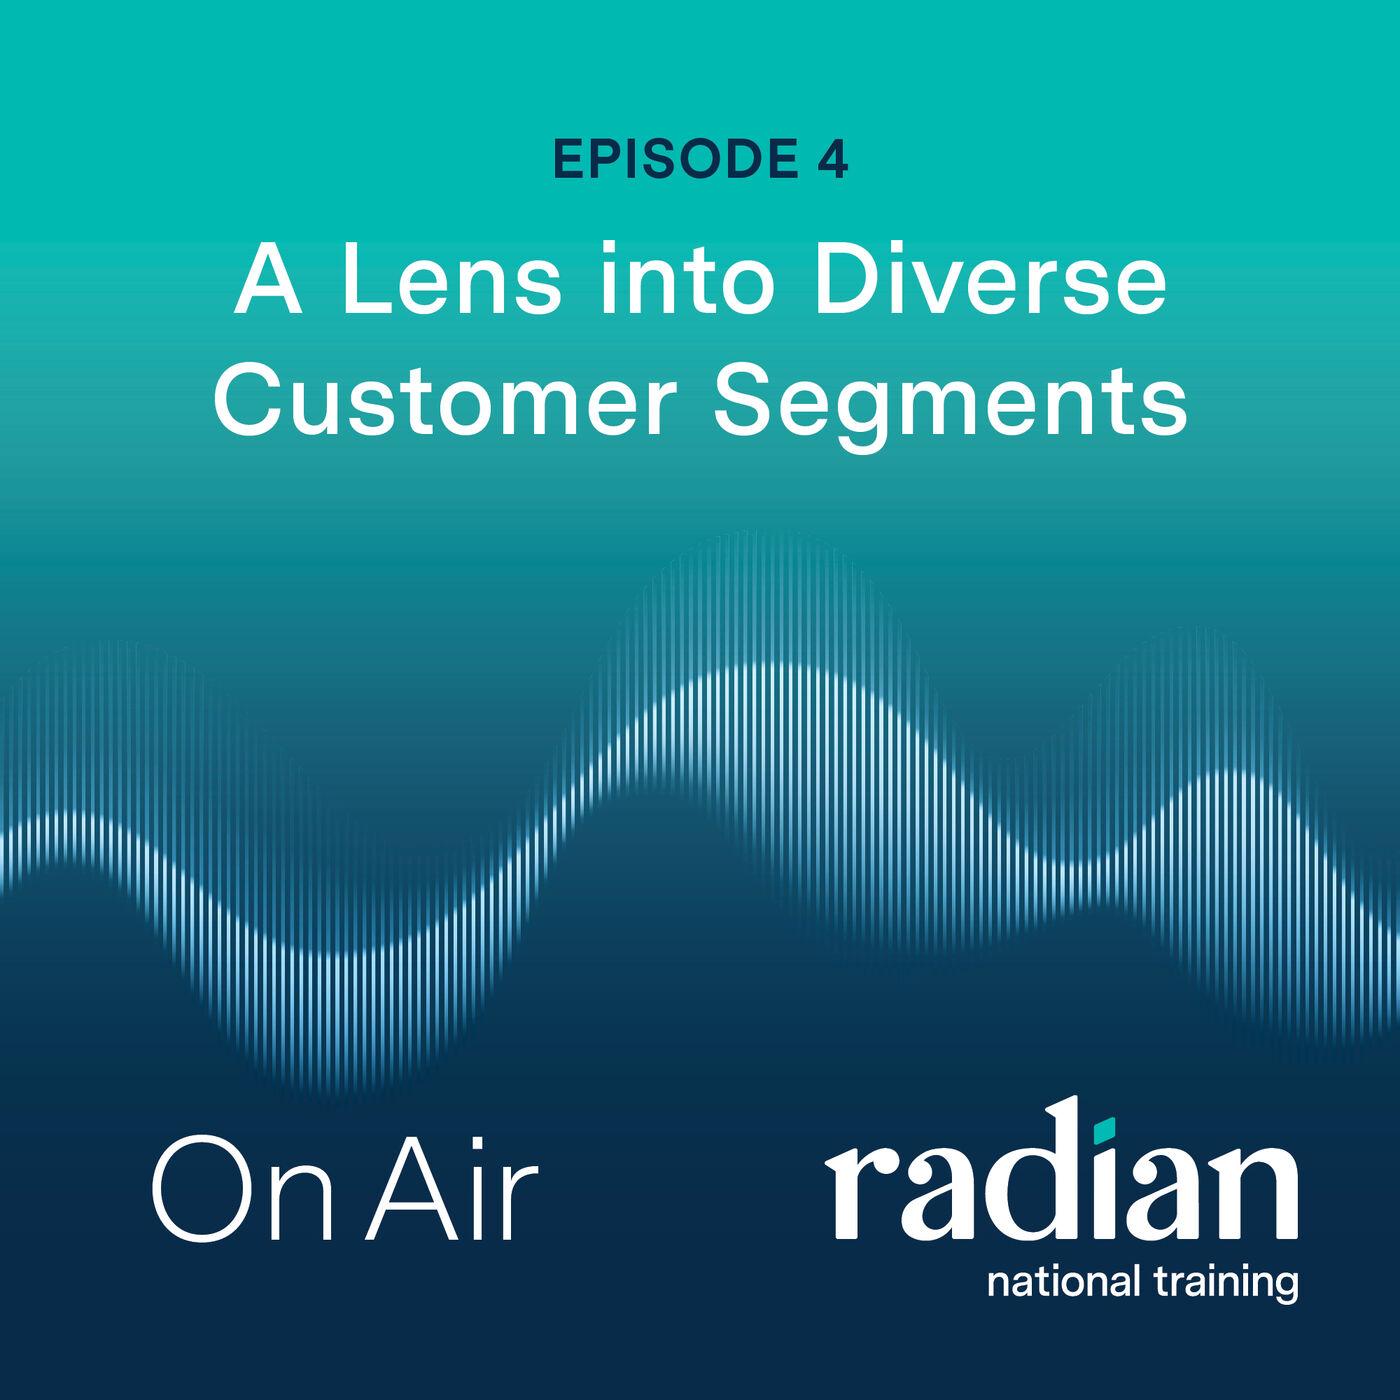 A Lens into Diverse Customer Segments